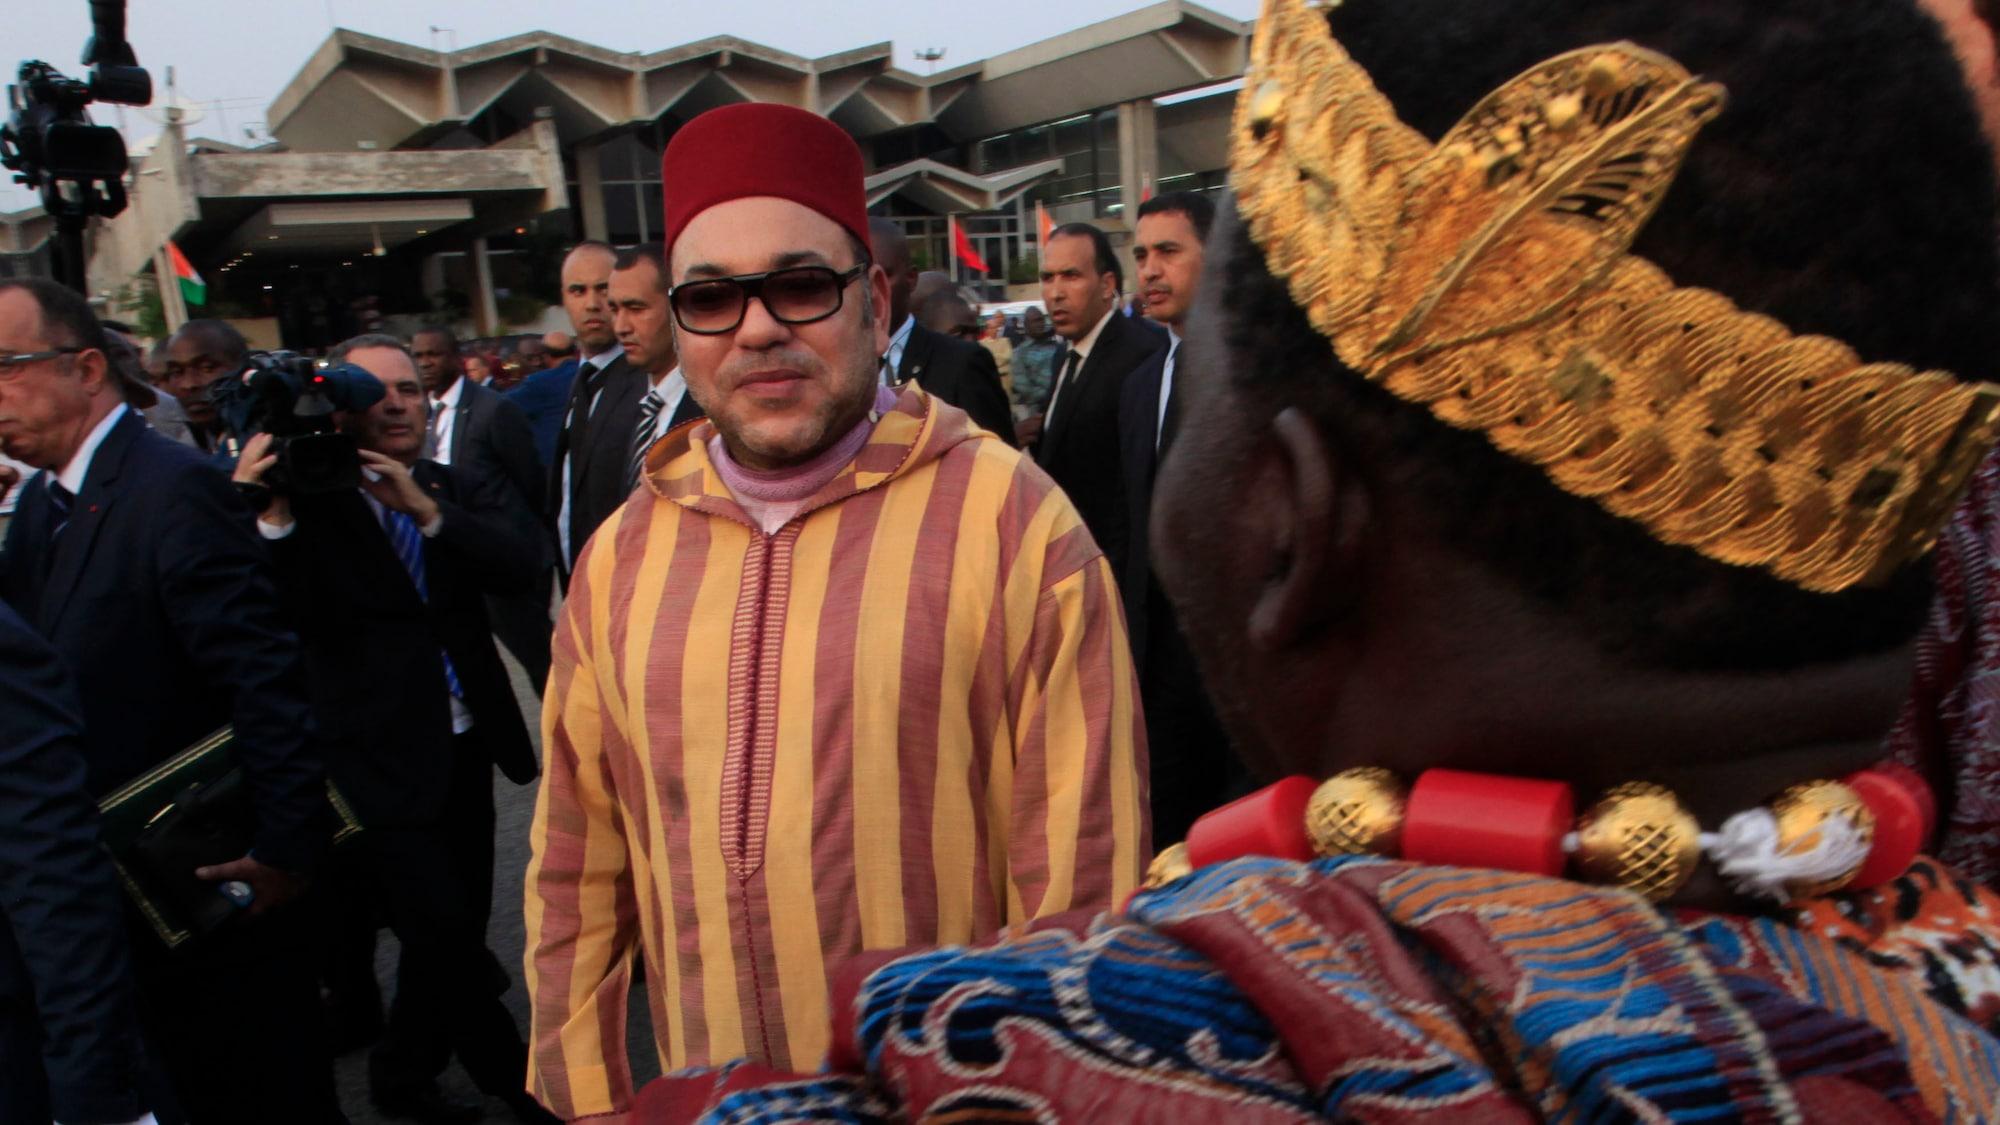 15 Jahre Knast: Putzfrau klaut Uhren von Marokkos König